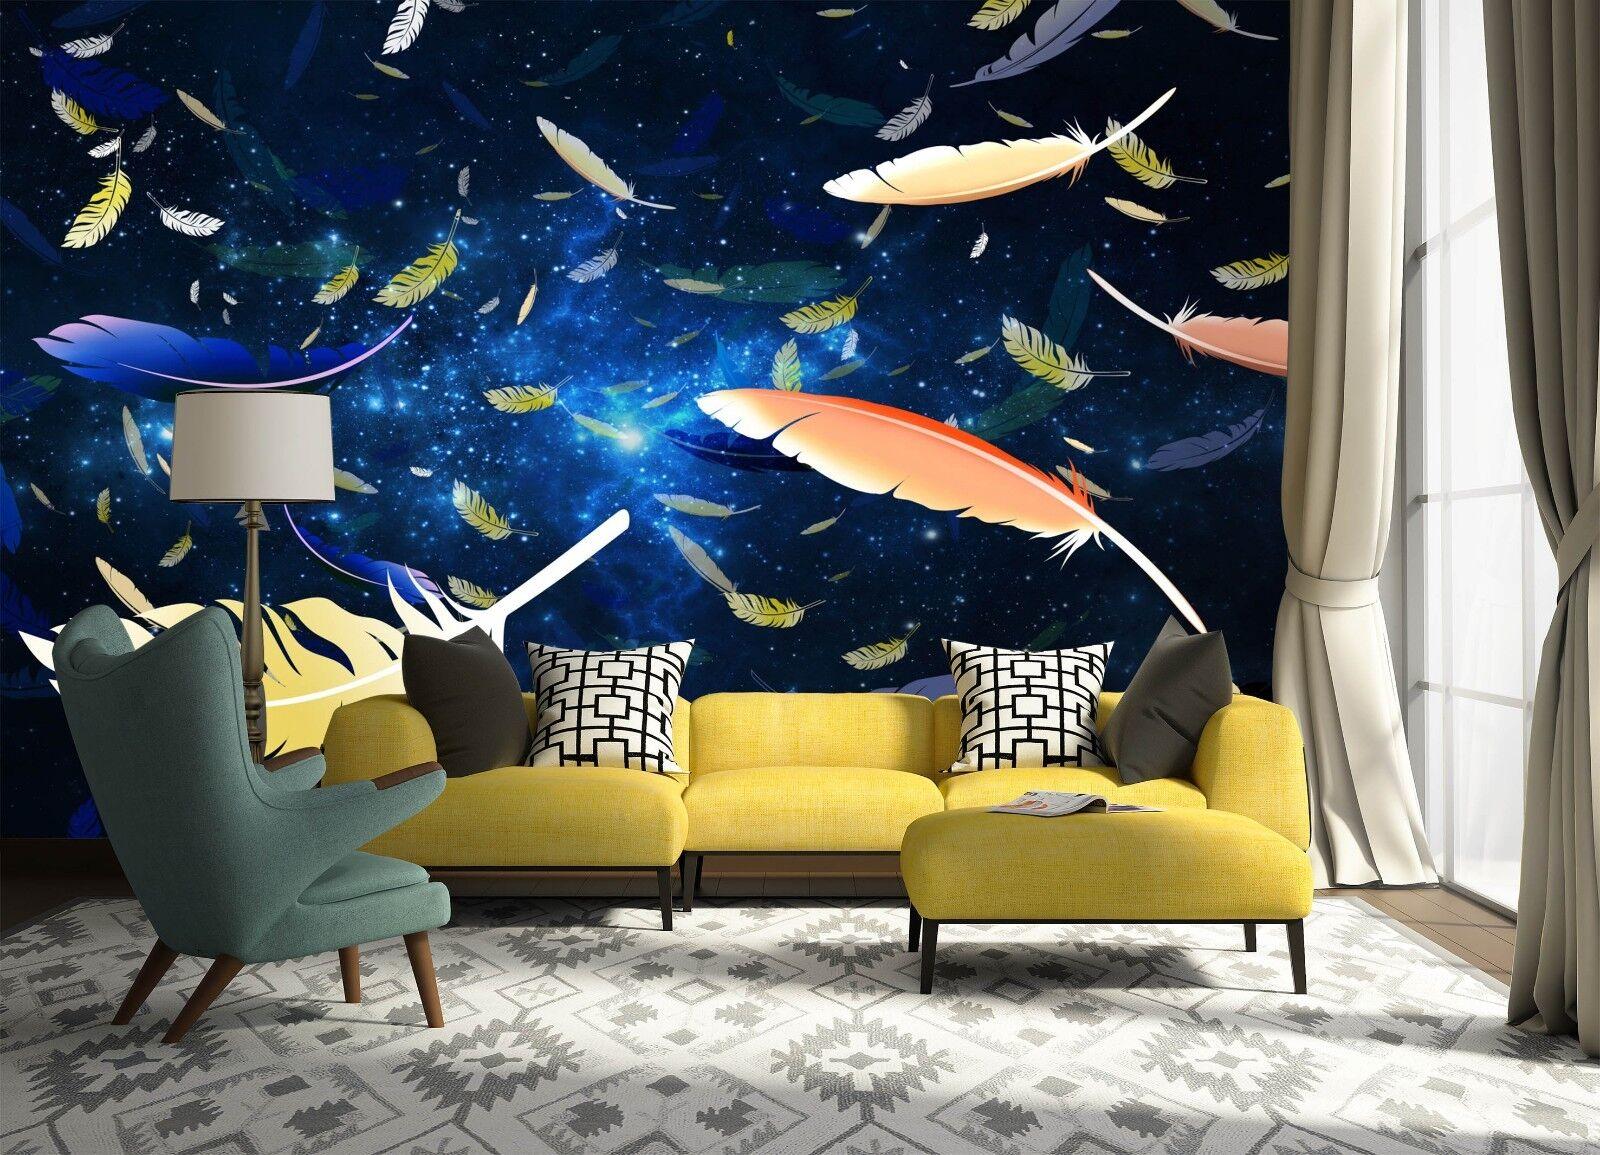 3D Sterne Federn Kunst 7983 Tapete Wandgemälde Tapeten Bild Familie DE Jenny   Billig    Elegantes Aussehen    Creative